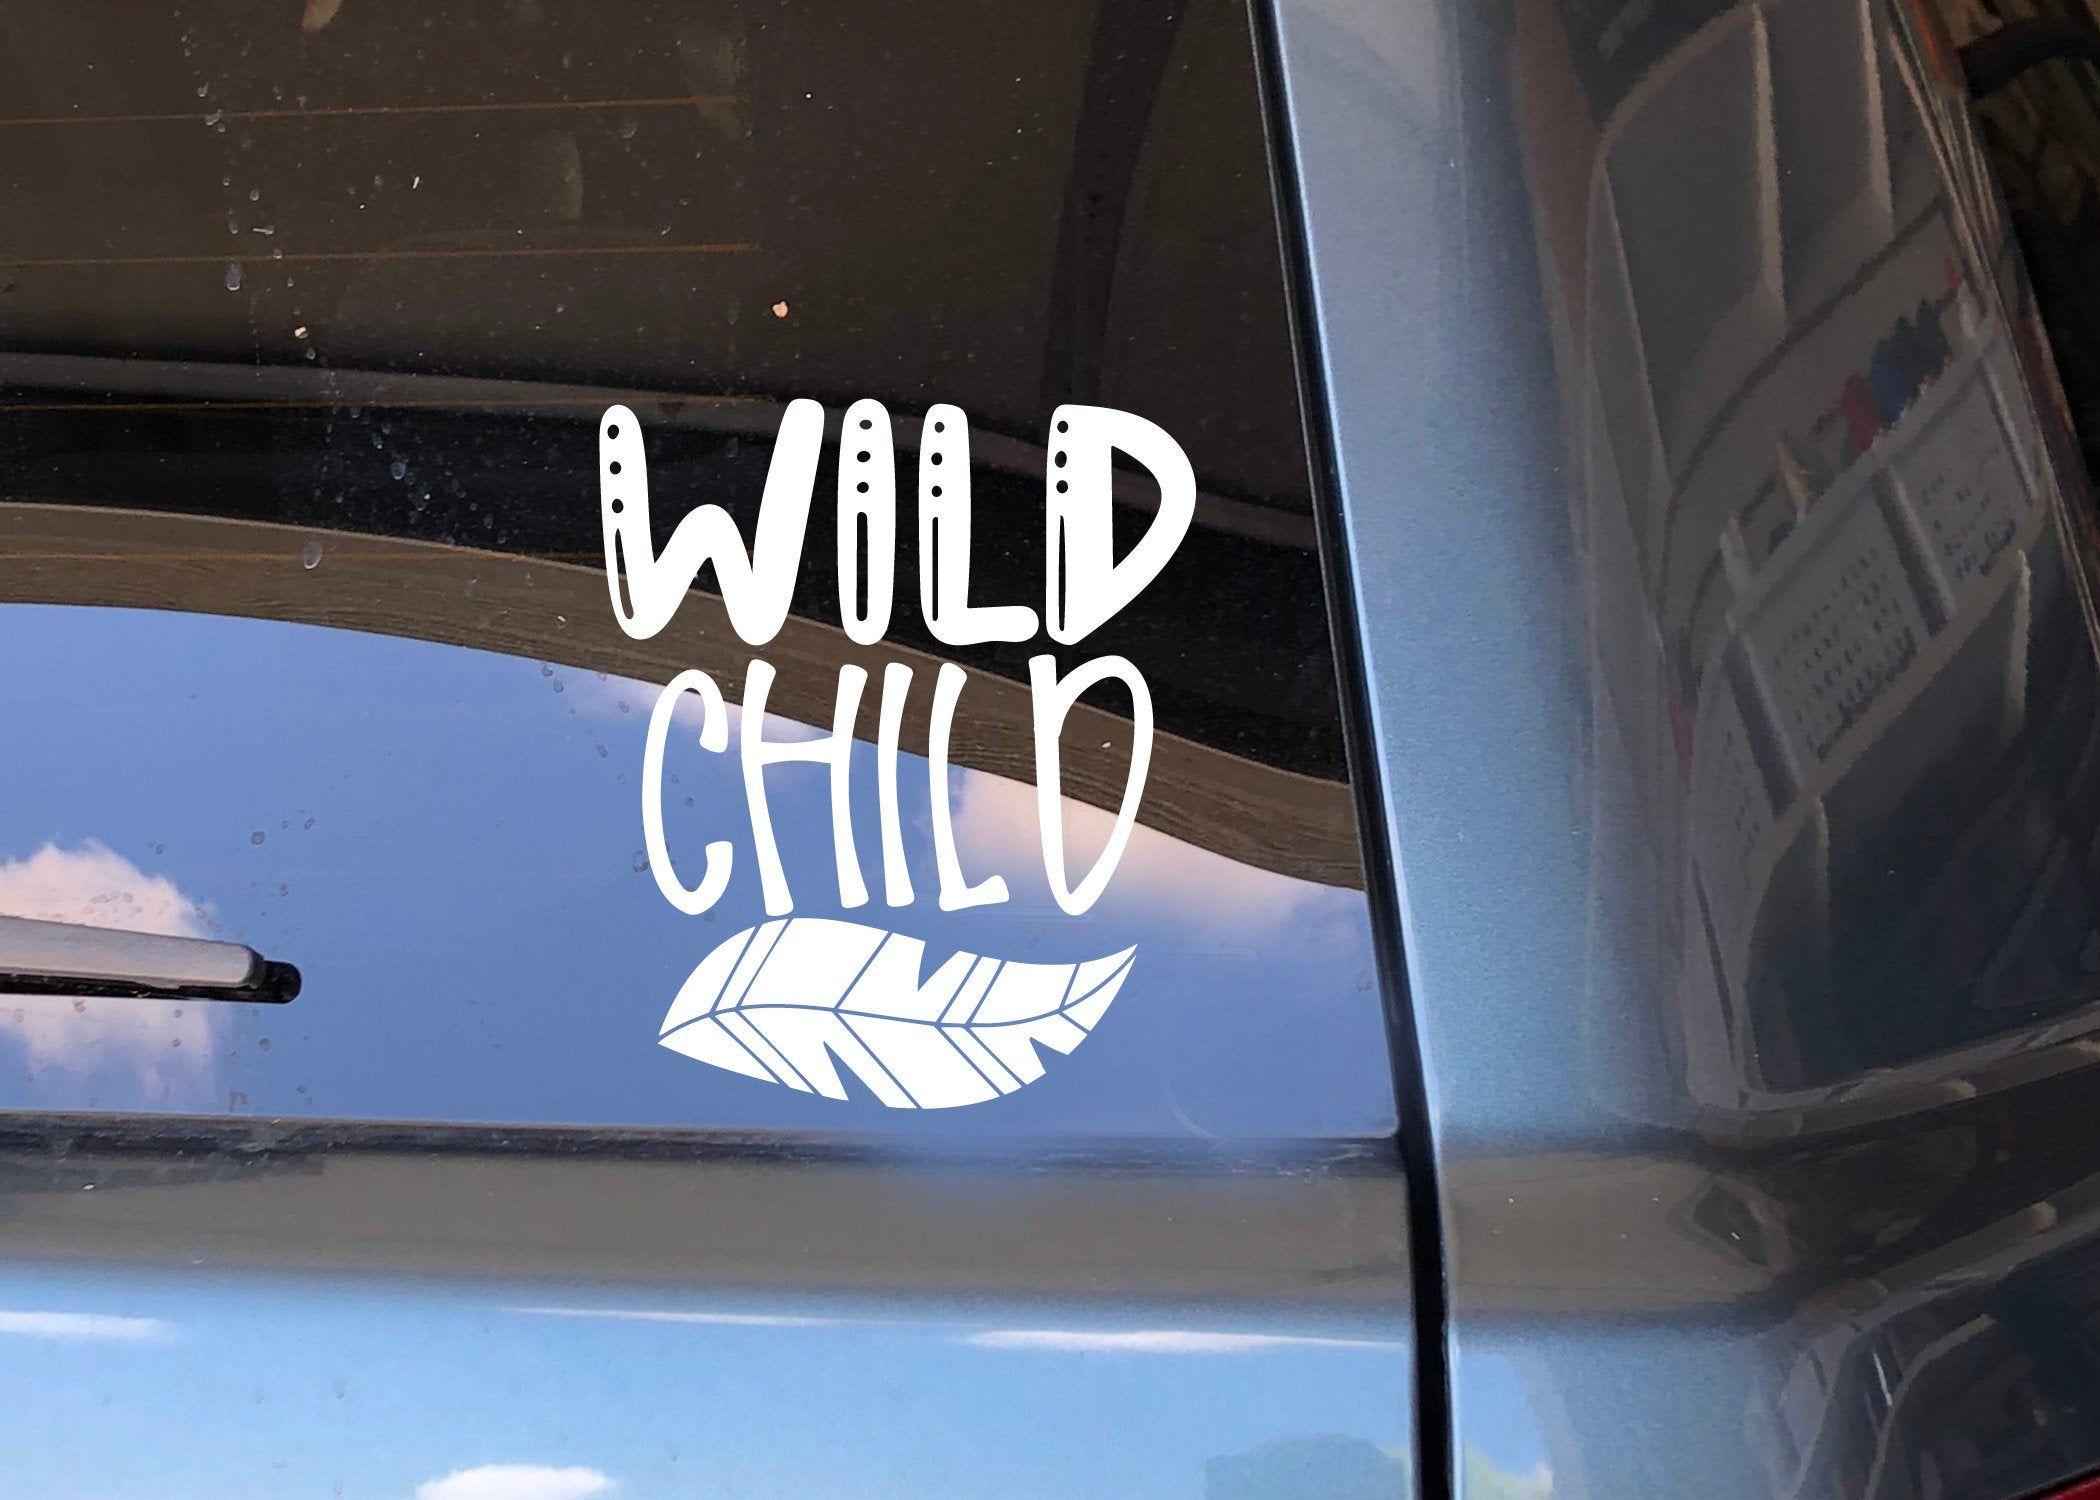 Car Decal Wild Child Vinyl Decal Car Accessories Car Sticker Bumper Sticker Window Decal By Bebopandbug On Car Decals Vinyl Car Decals Vinyl Decals [ 1500 x 2100 Pixel ]